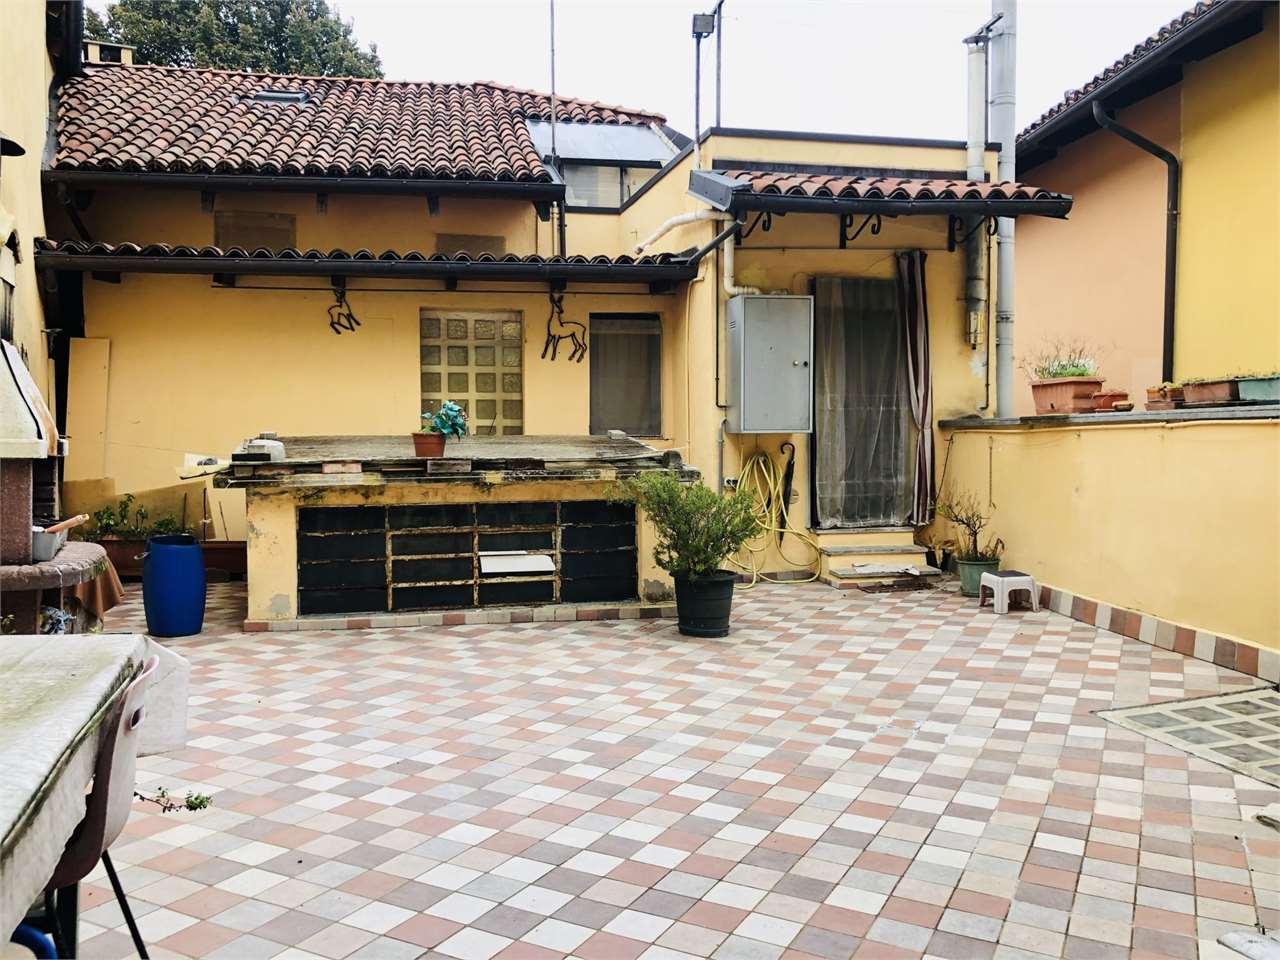 Vendita Casa Indipendente Casa/Villa Chieri Via San Giorgio 14 227117